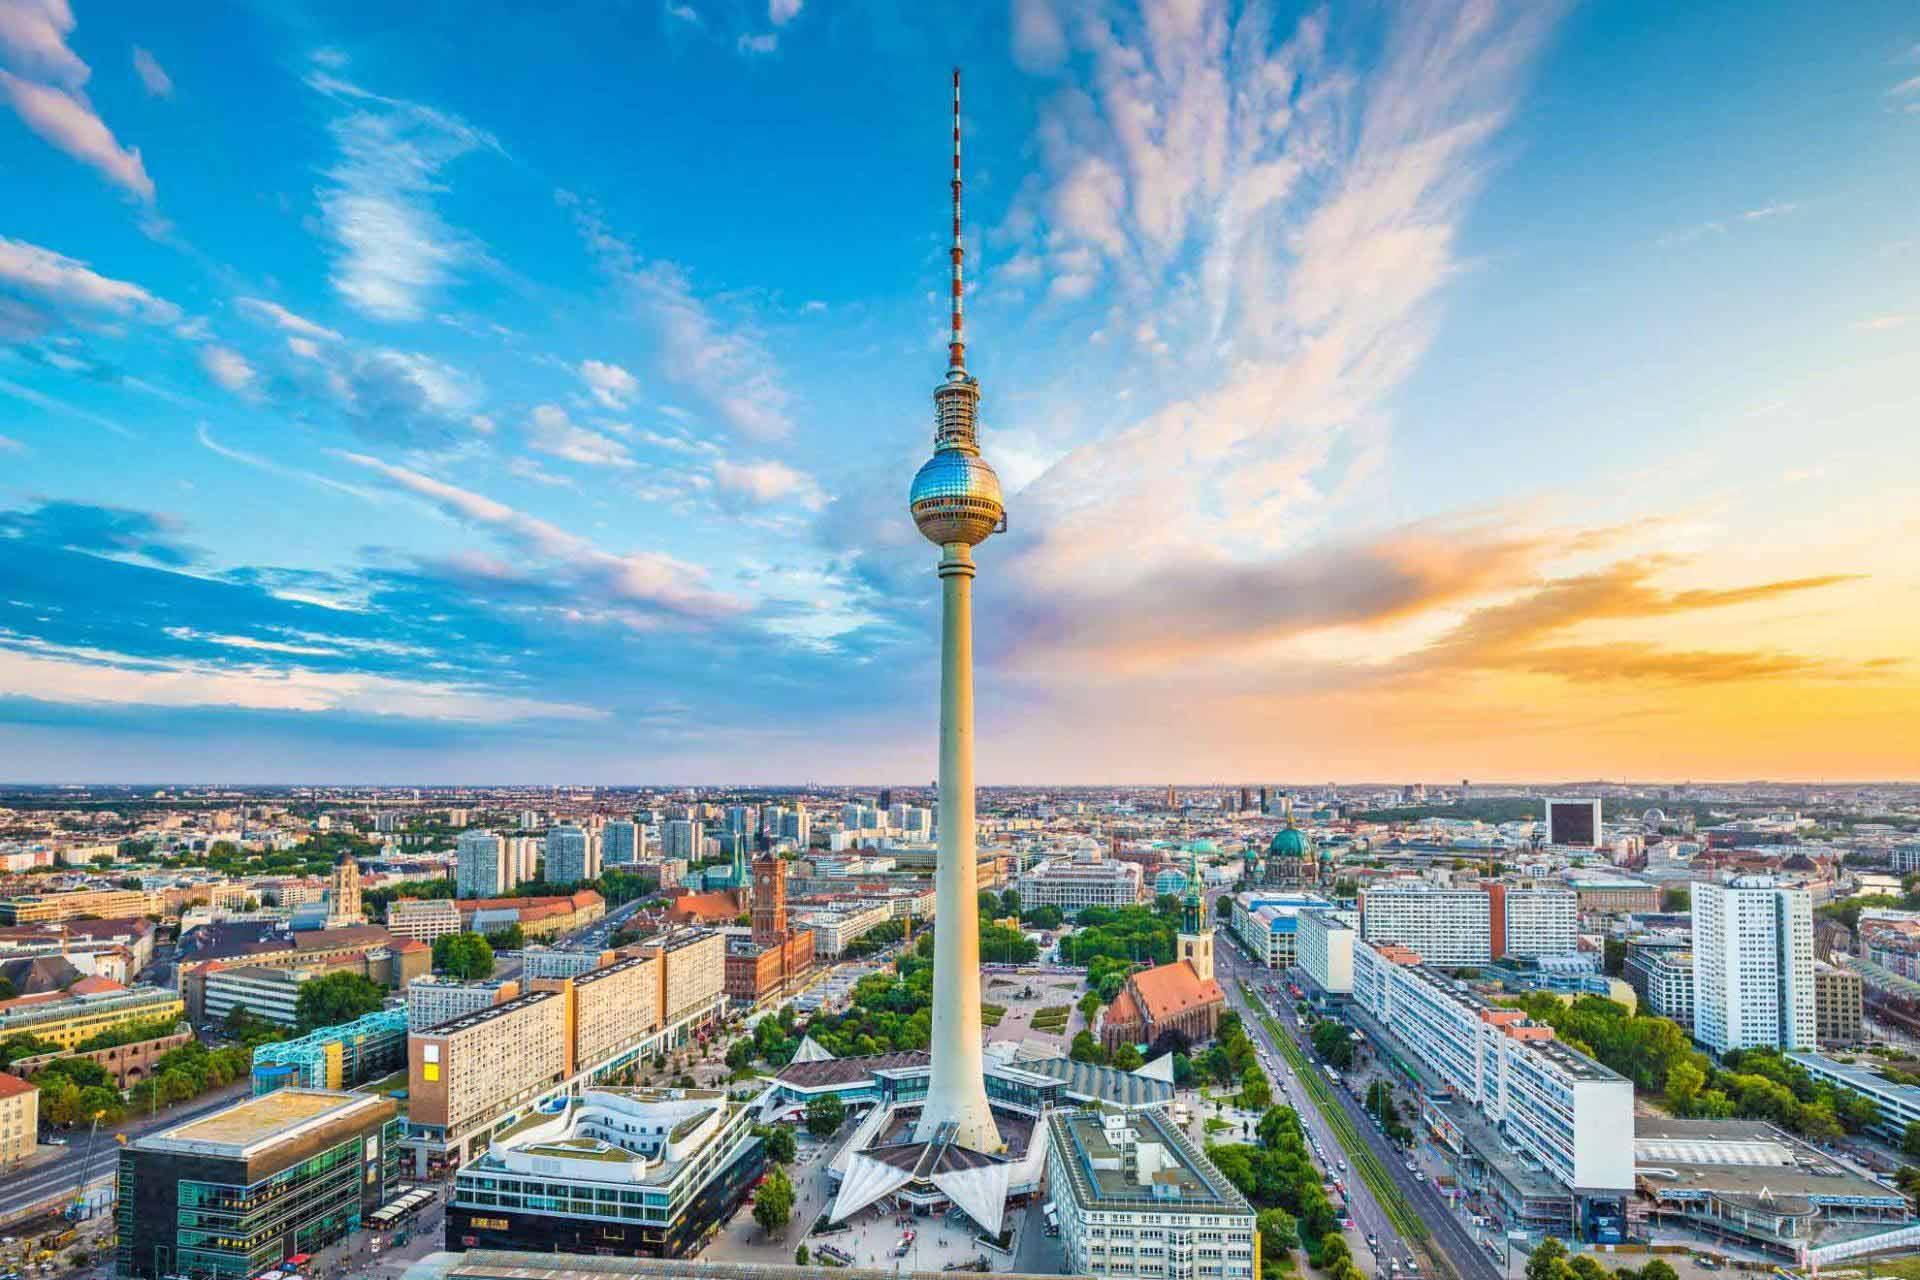 Blick auf den Berliner Fernsehturm in 110m Höhe